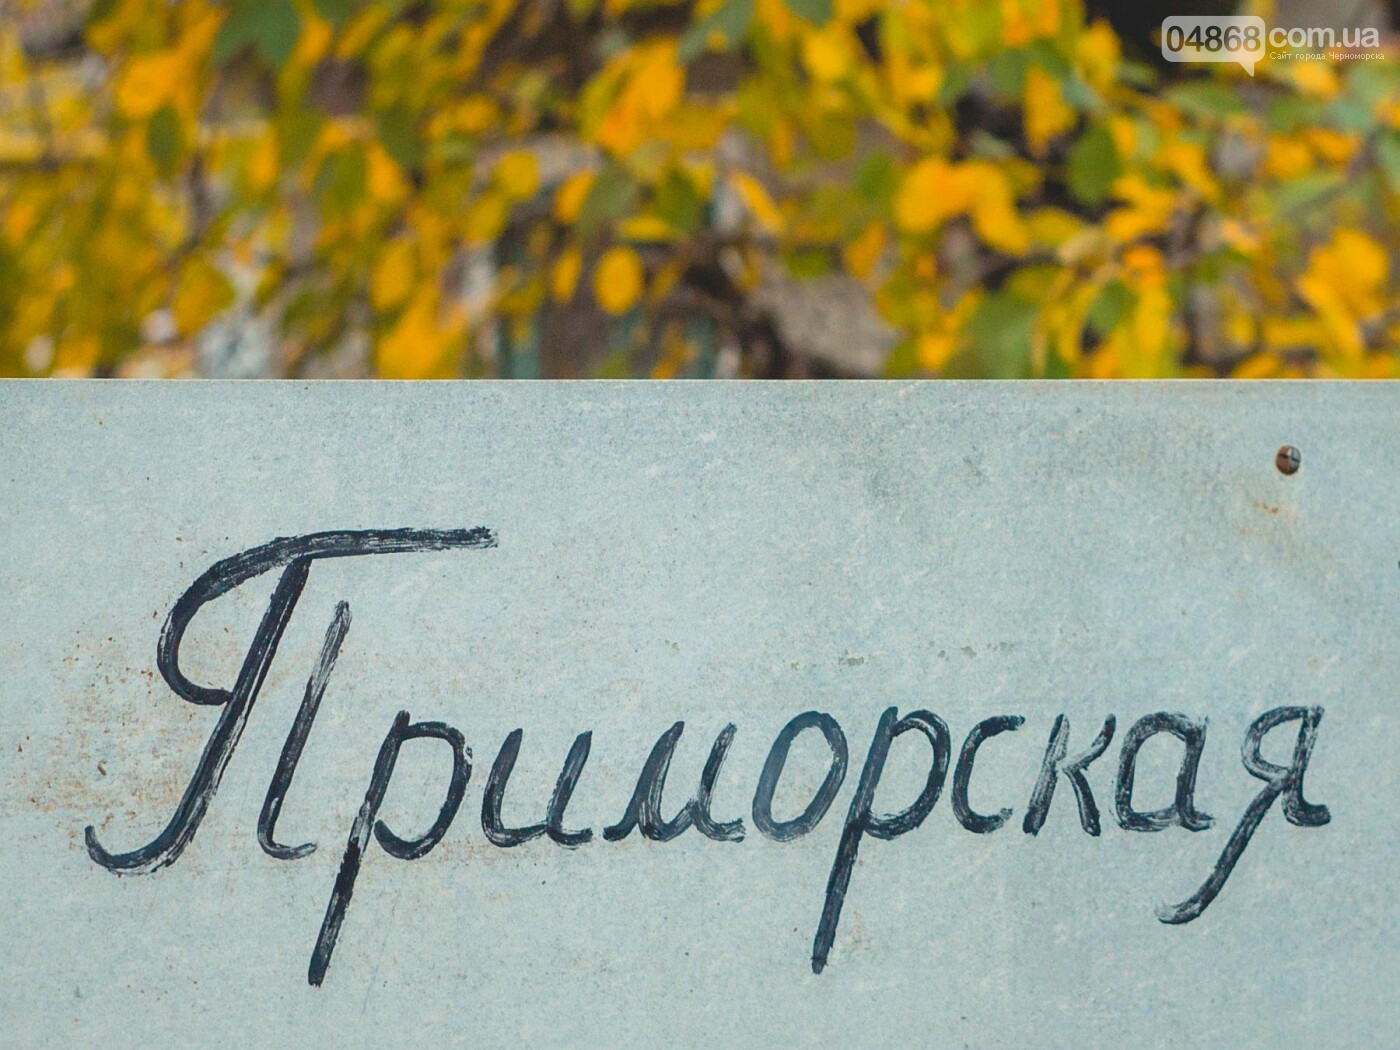 Водоснабжение на улице Приморской восстановлено, фото-9